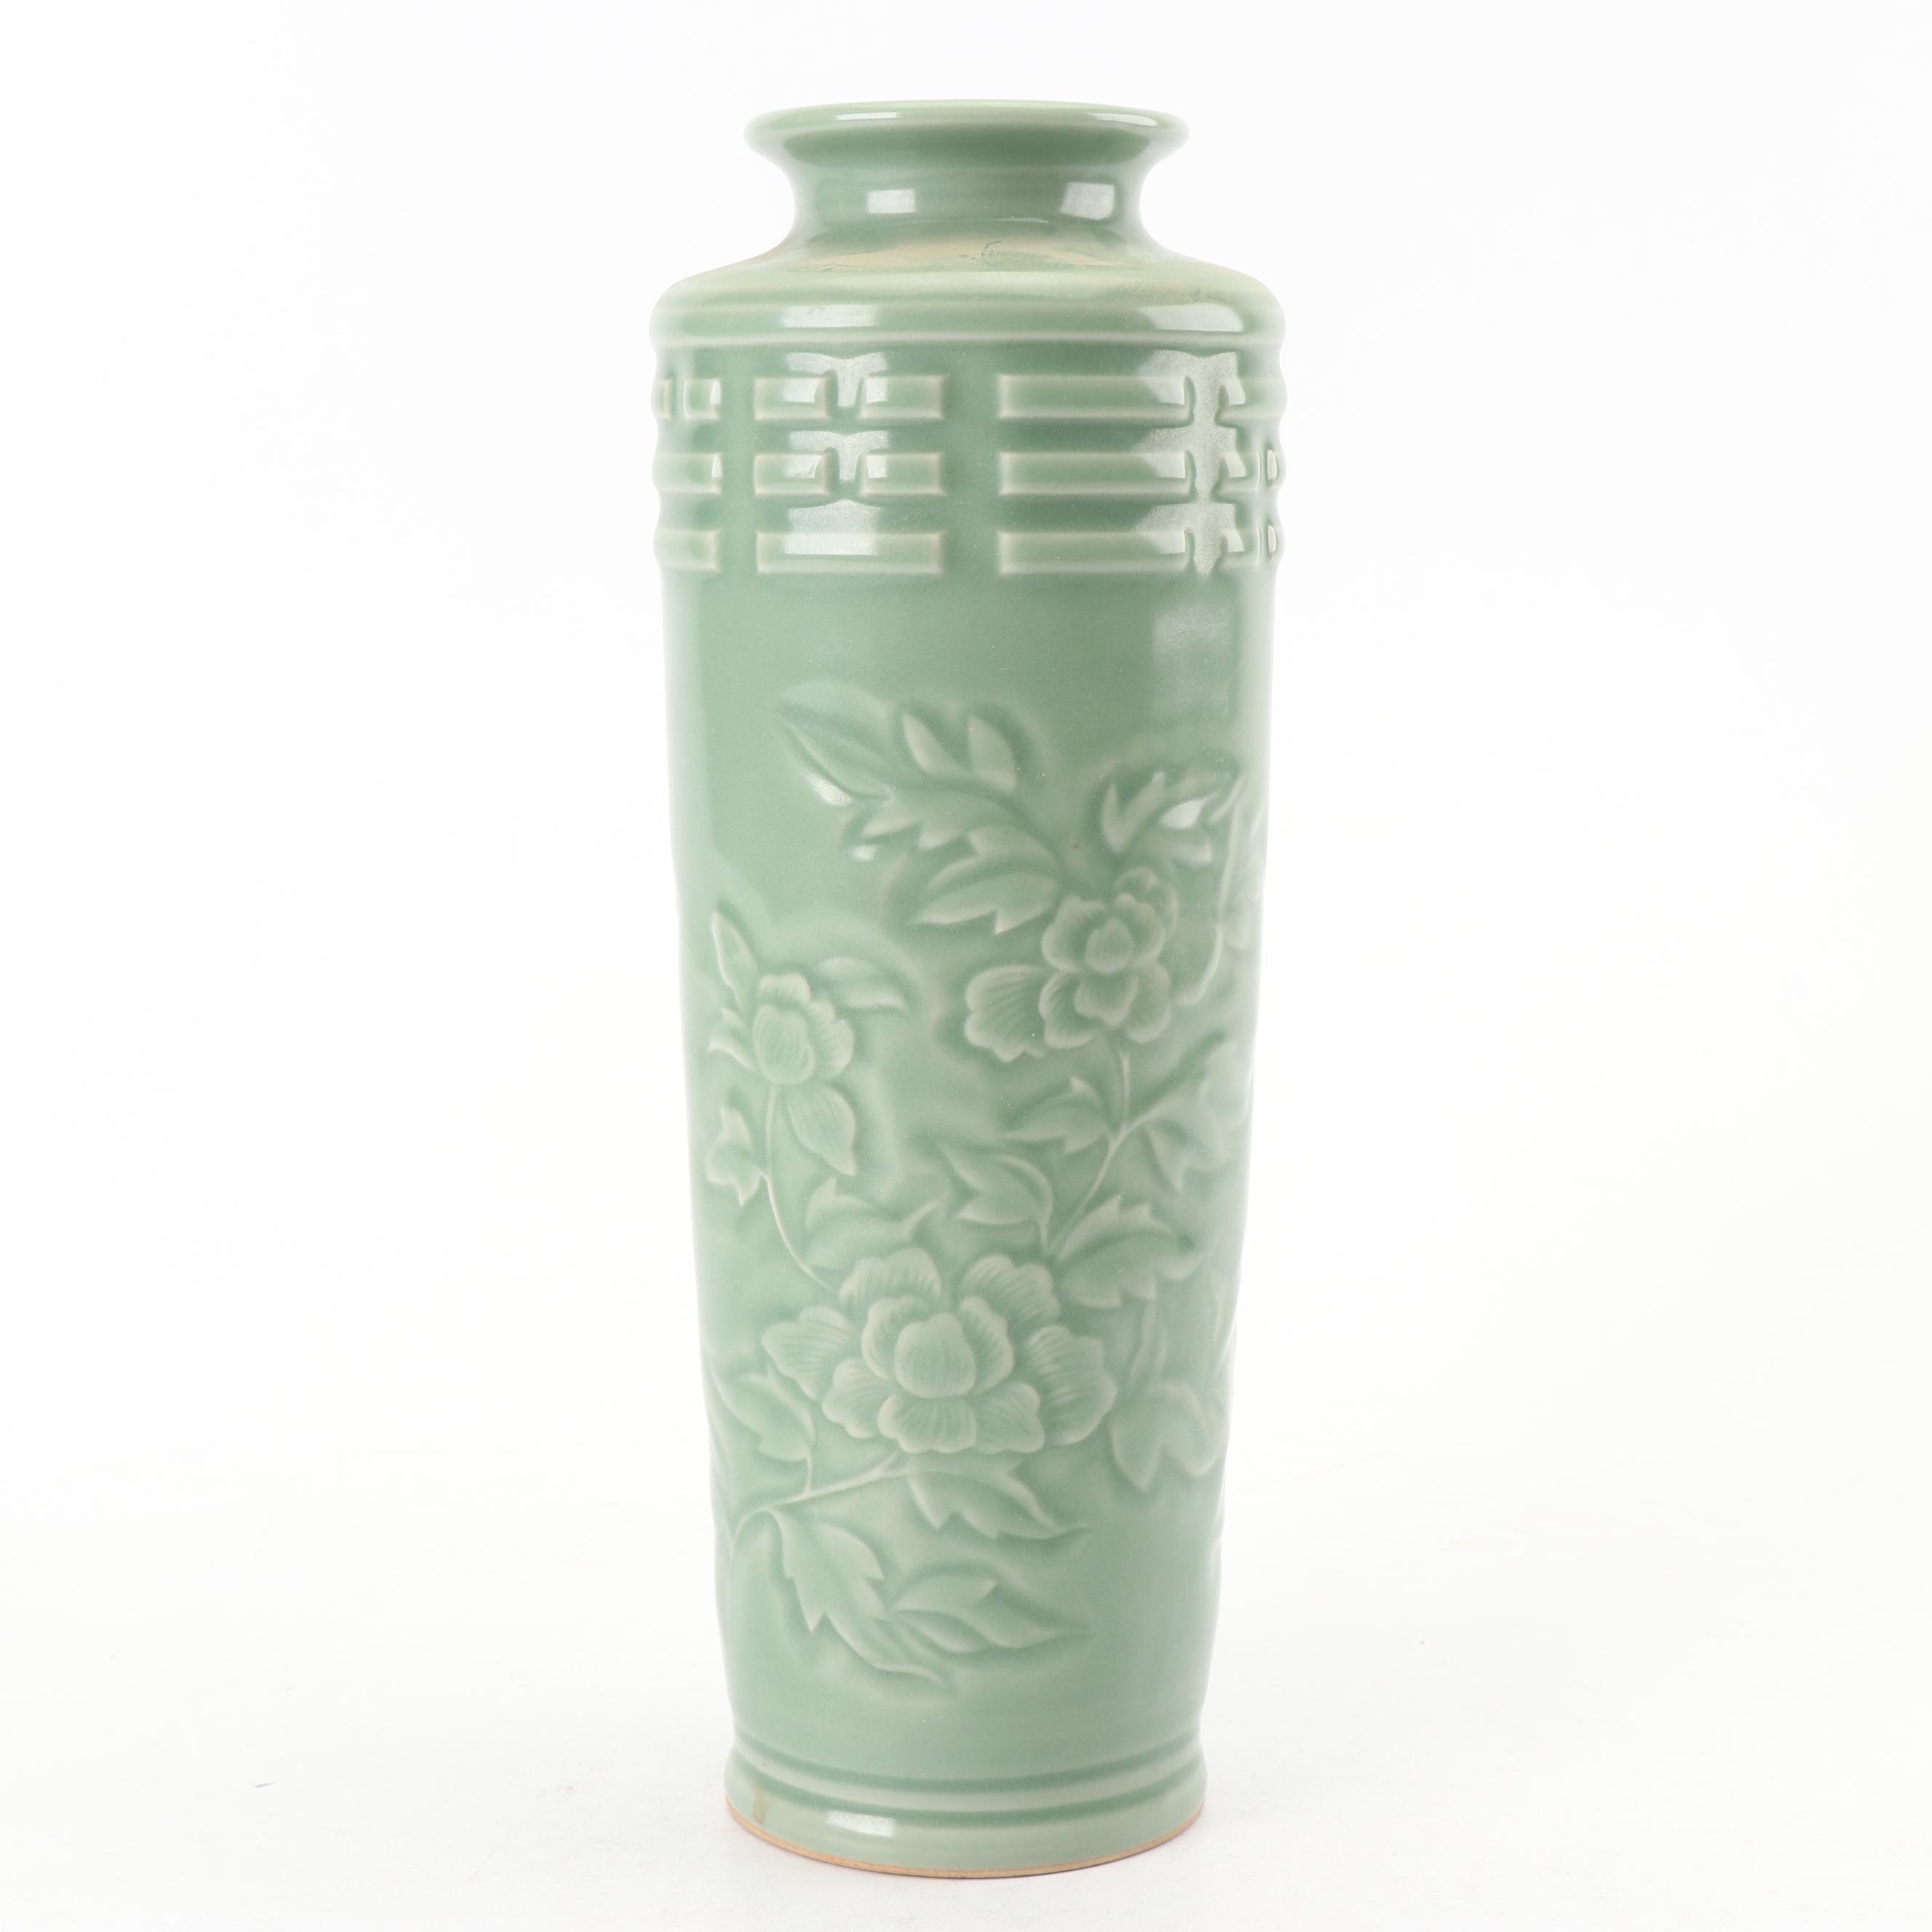 Chinese Relief Floral Motif Celadon Vase